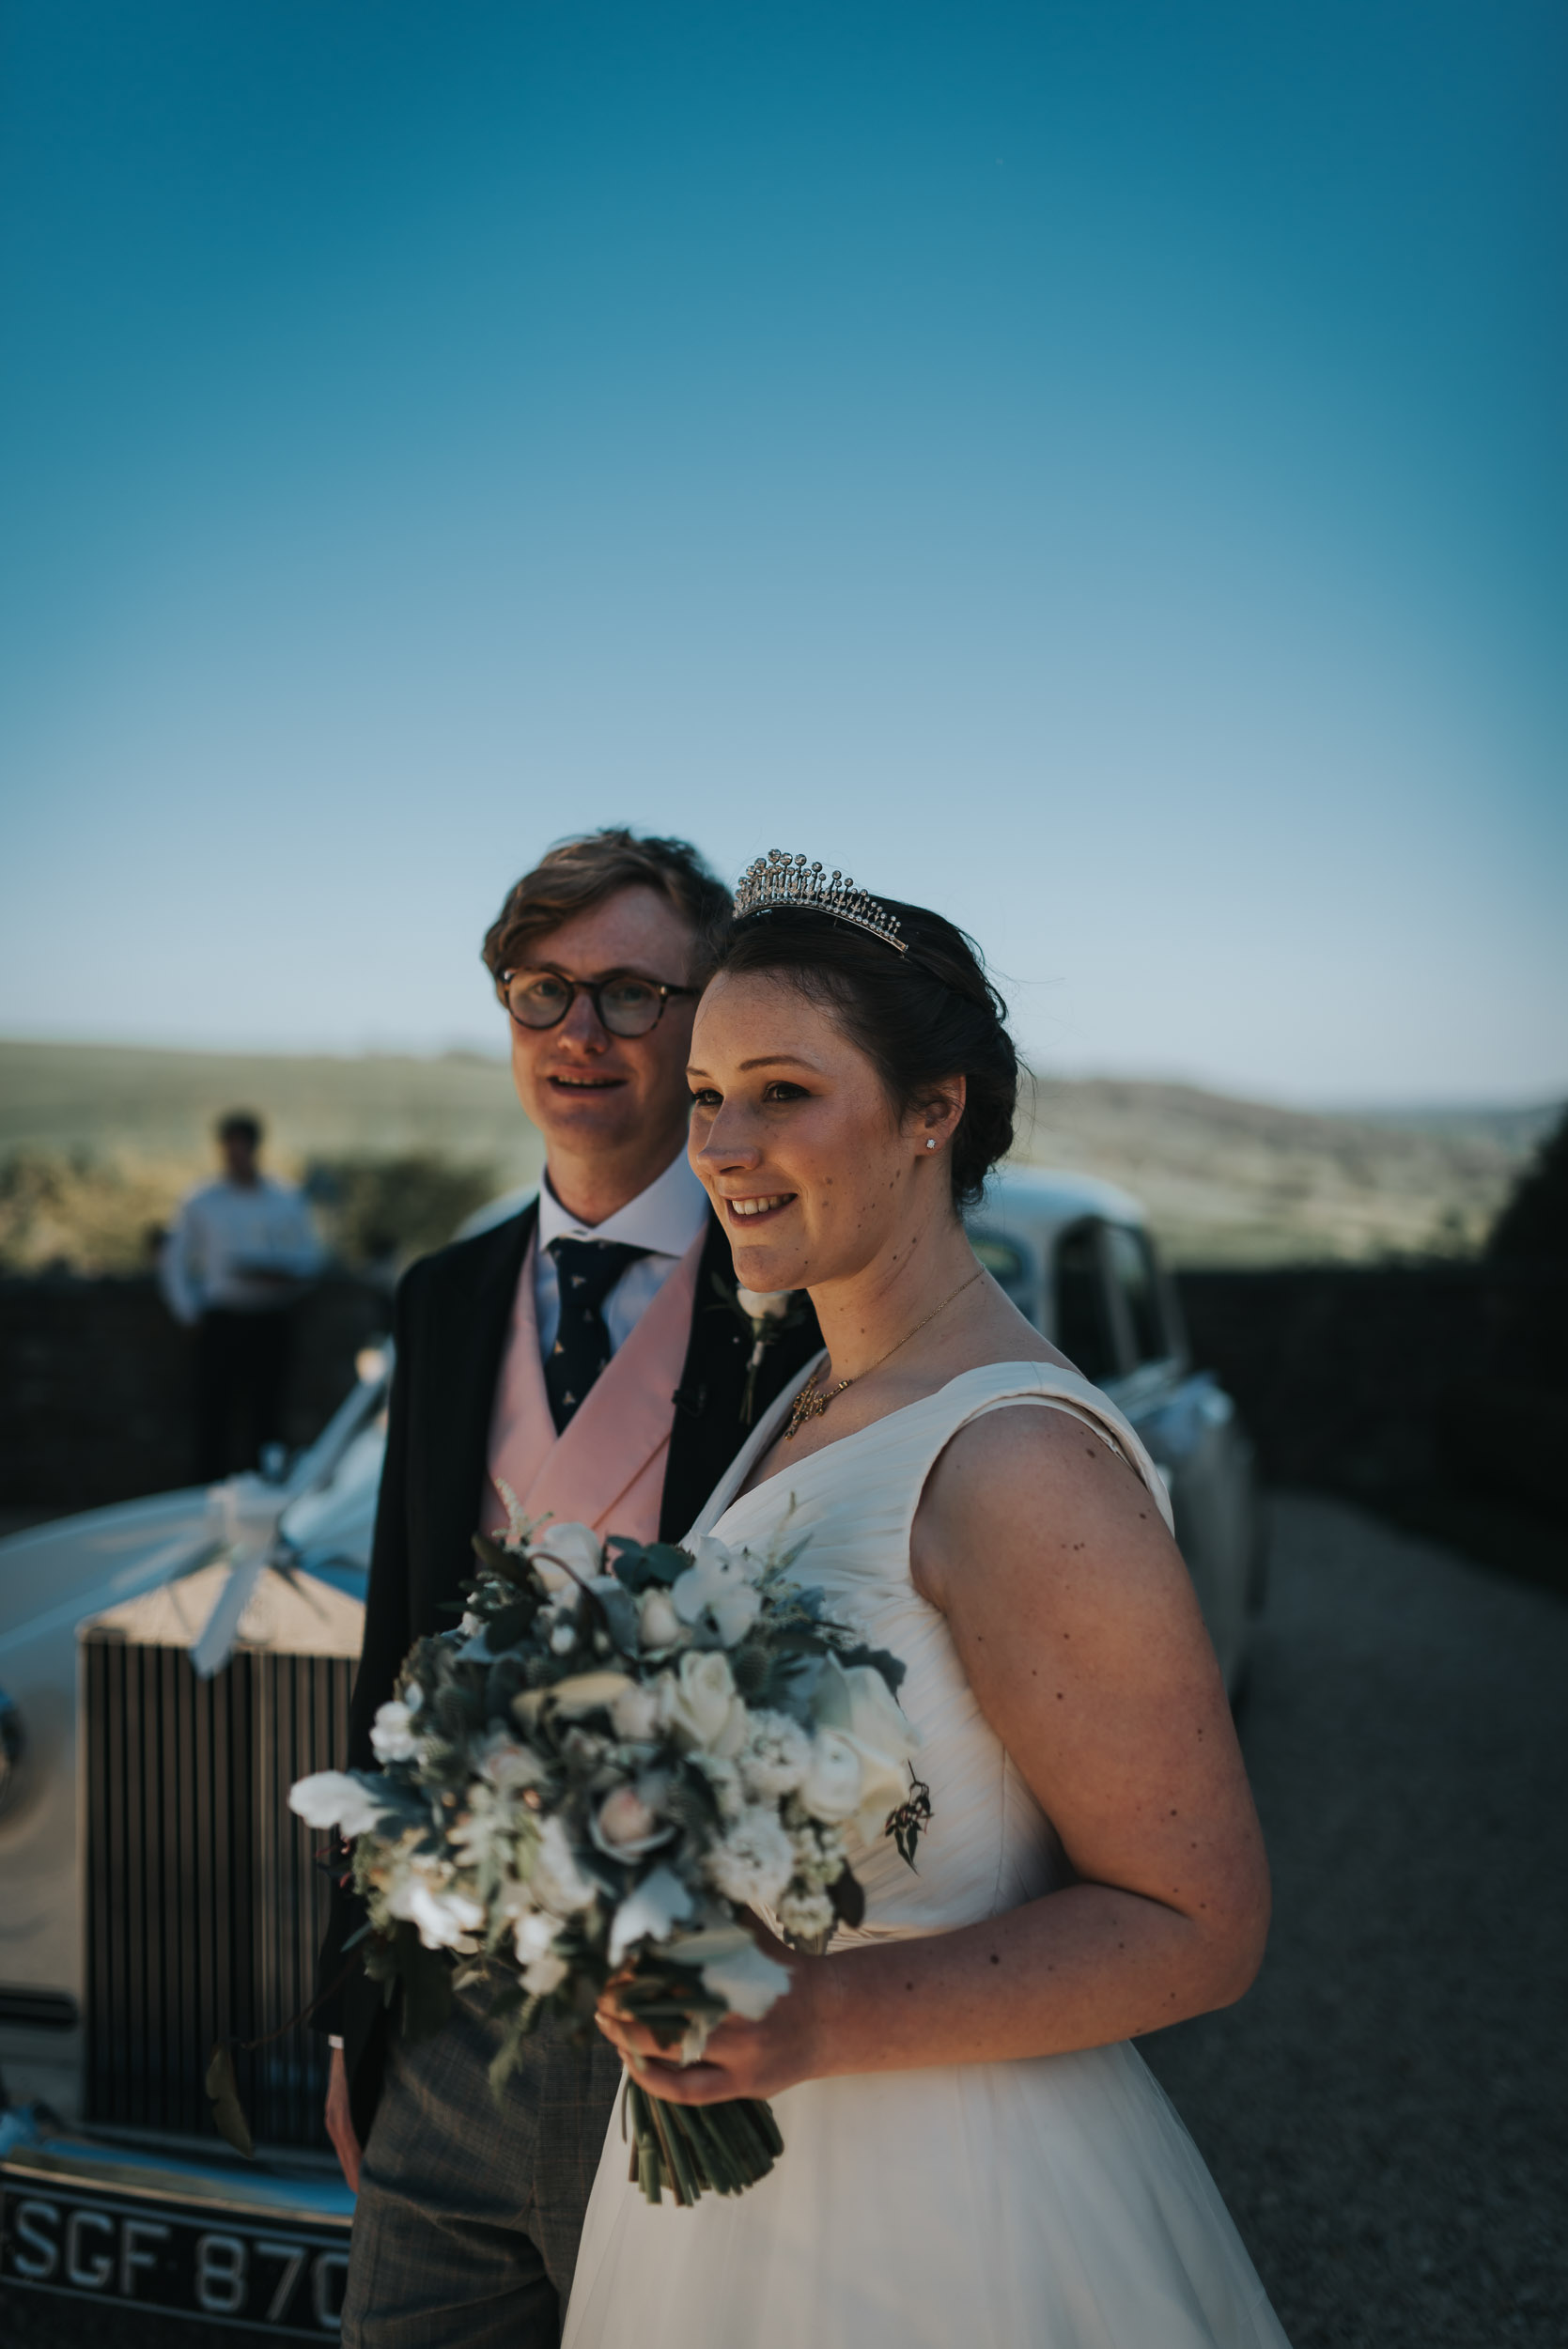 hamswell-house-wedding-photographer-w84.jpg